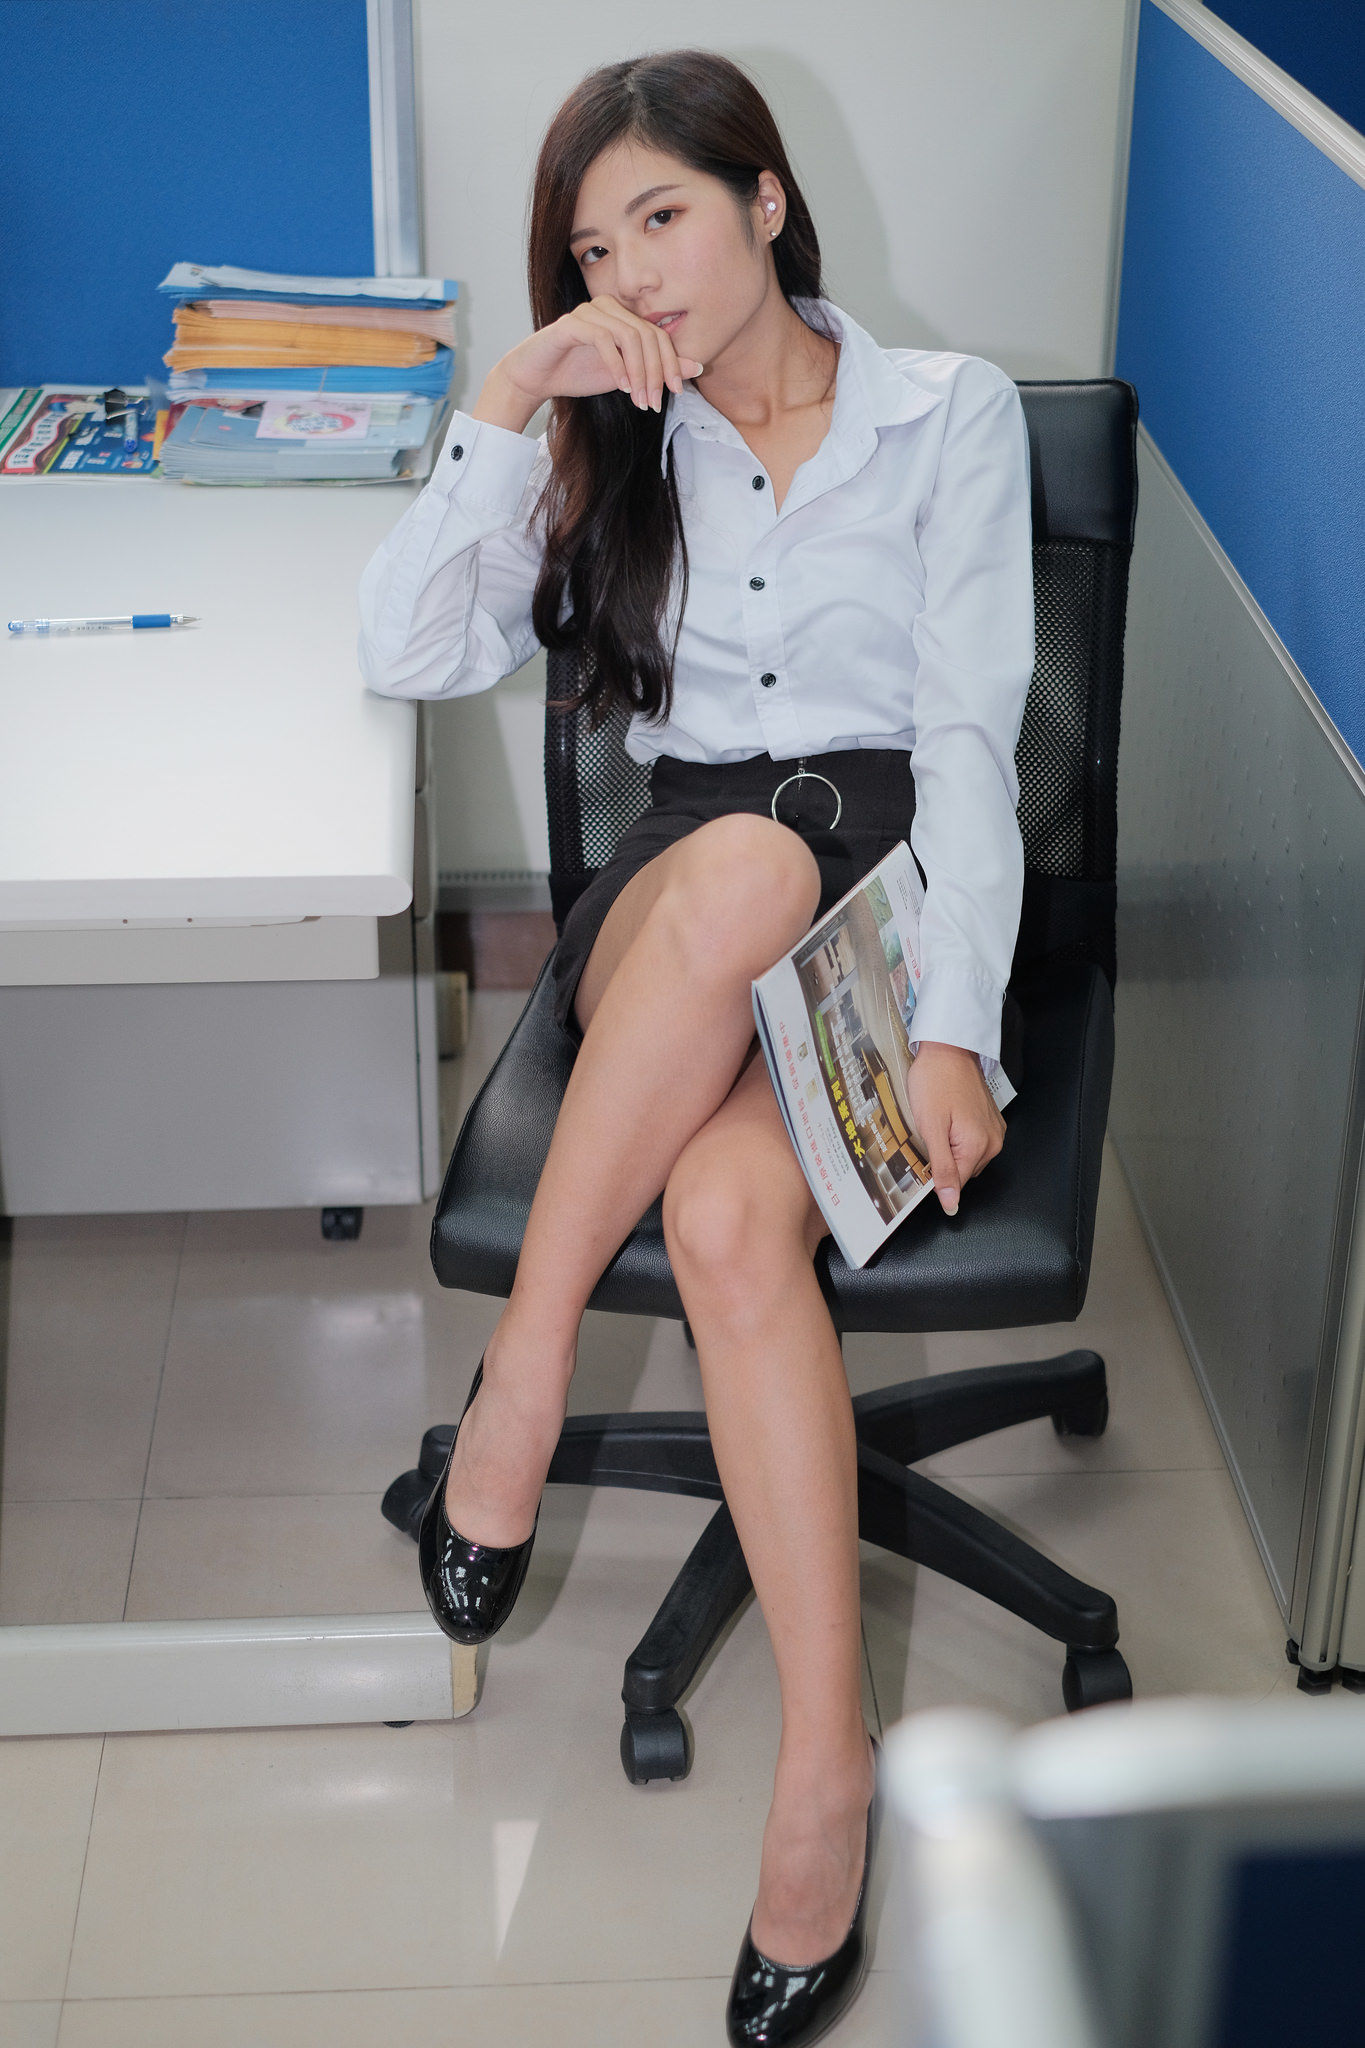 VOL.759 [台湾正妹]职业装OL美女:方唯真(Chubby唯真)超高清个人性感漂亮大图(18P)